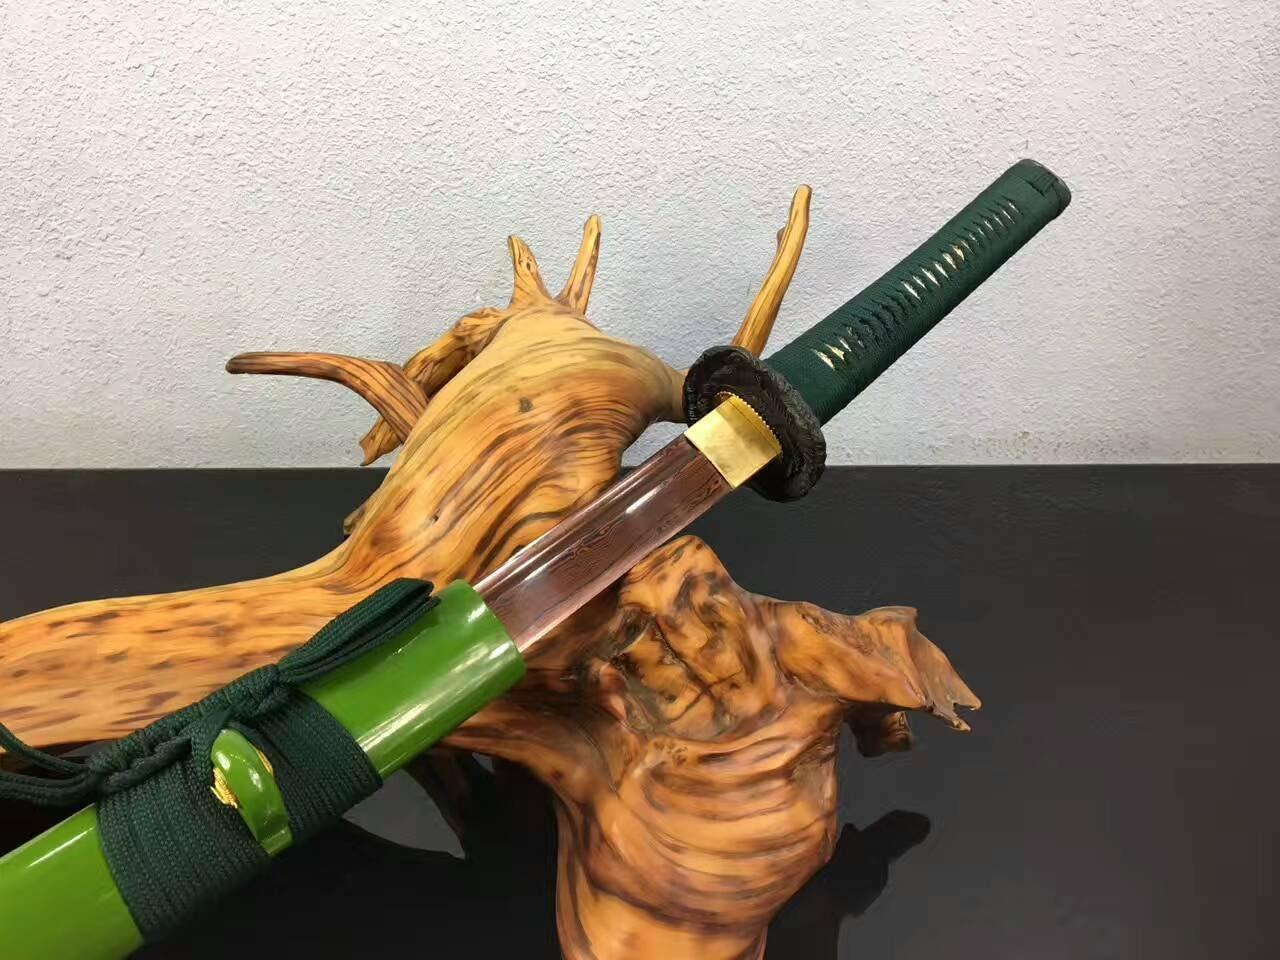 KATANA Samurai Sword, Hand Forged(Folded Steel red Blade,Green Scabbard,Alloy Fittings) Heat Tempered Full Tang Sharp